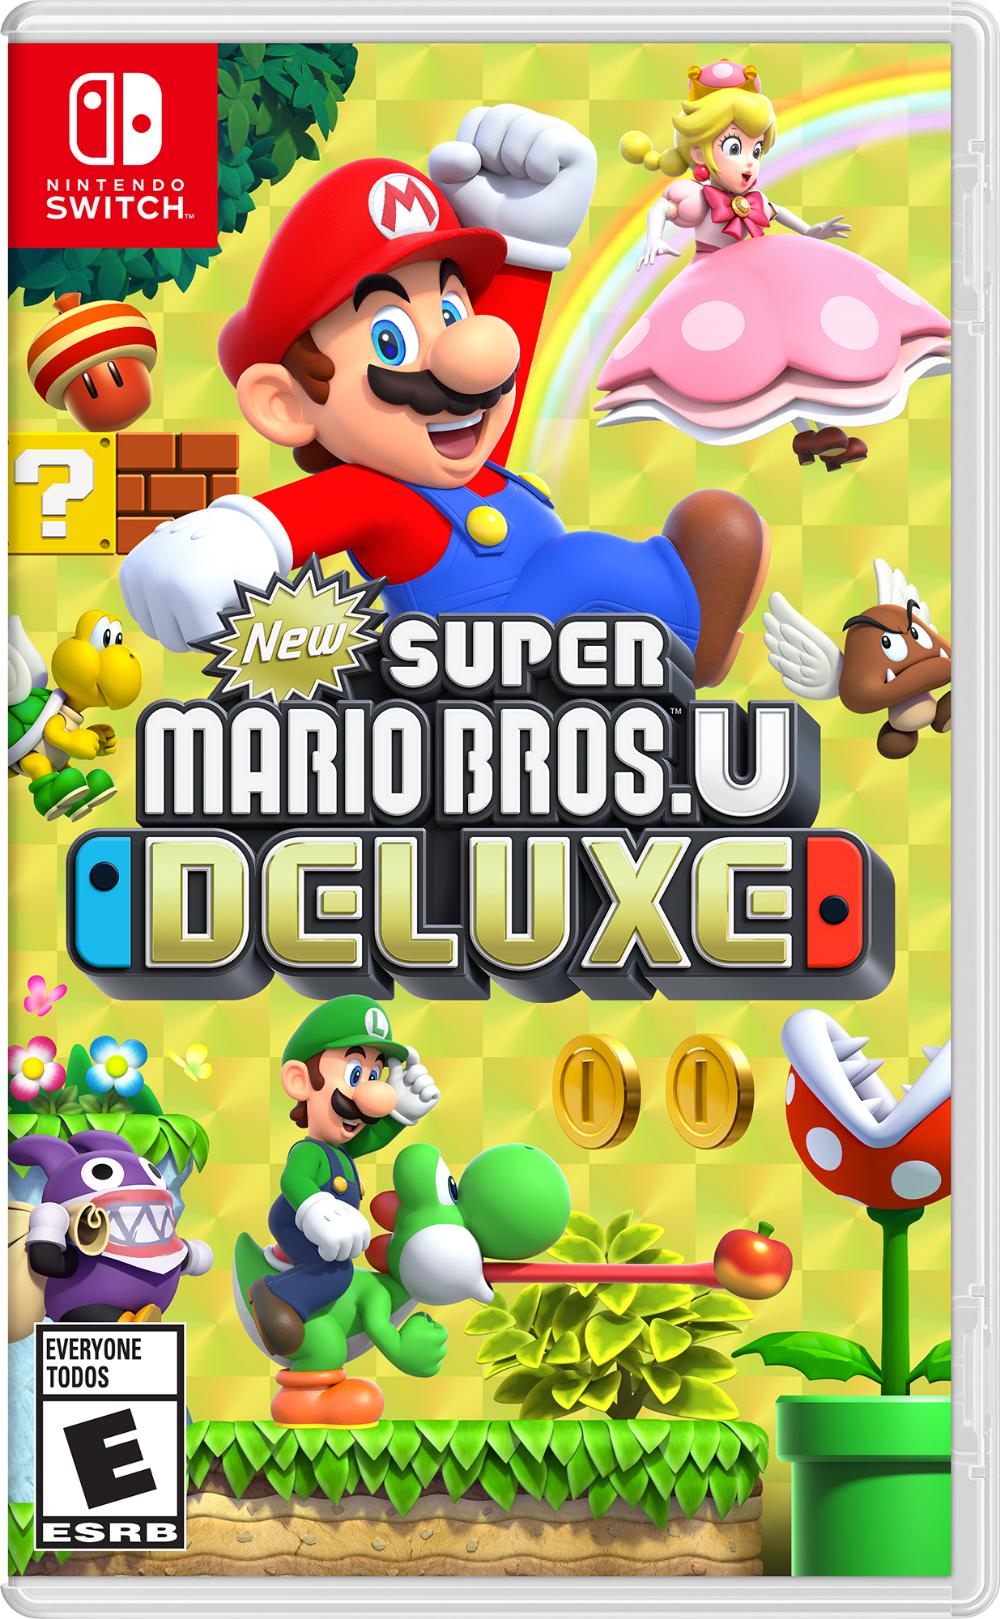 New Super Mario Bros U Deluxe Nintendo Nintendo Switch 045496592691 Walmart Com Super Mario Bros Mario Bros Mario Switch